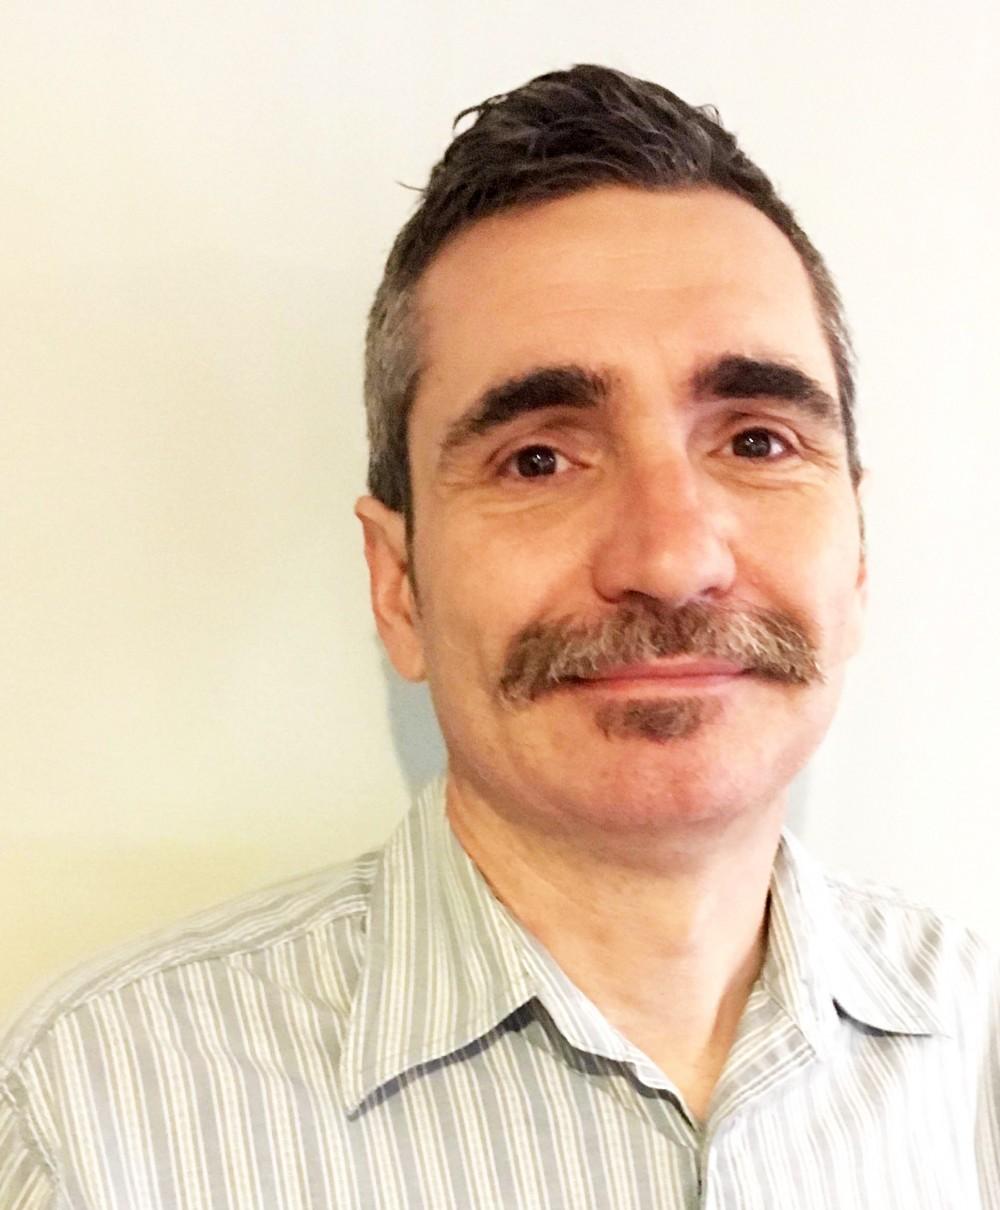 Jose Ignacio Ocana Durham Translation services for Bruton Translations